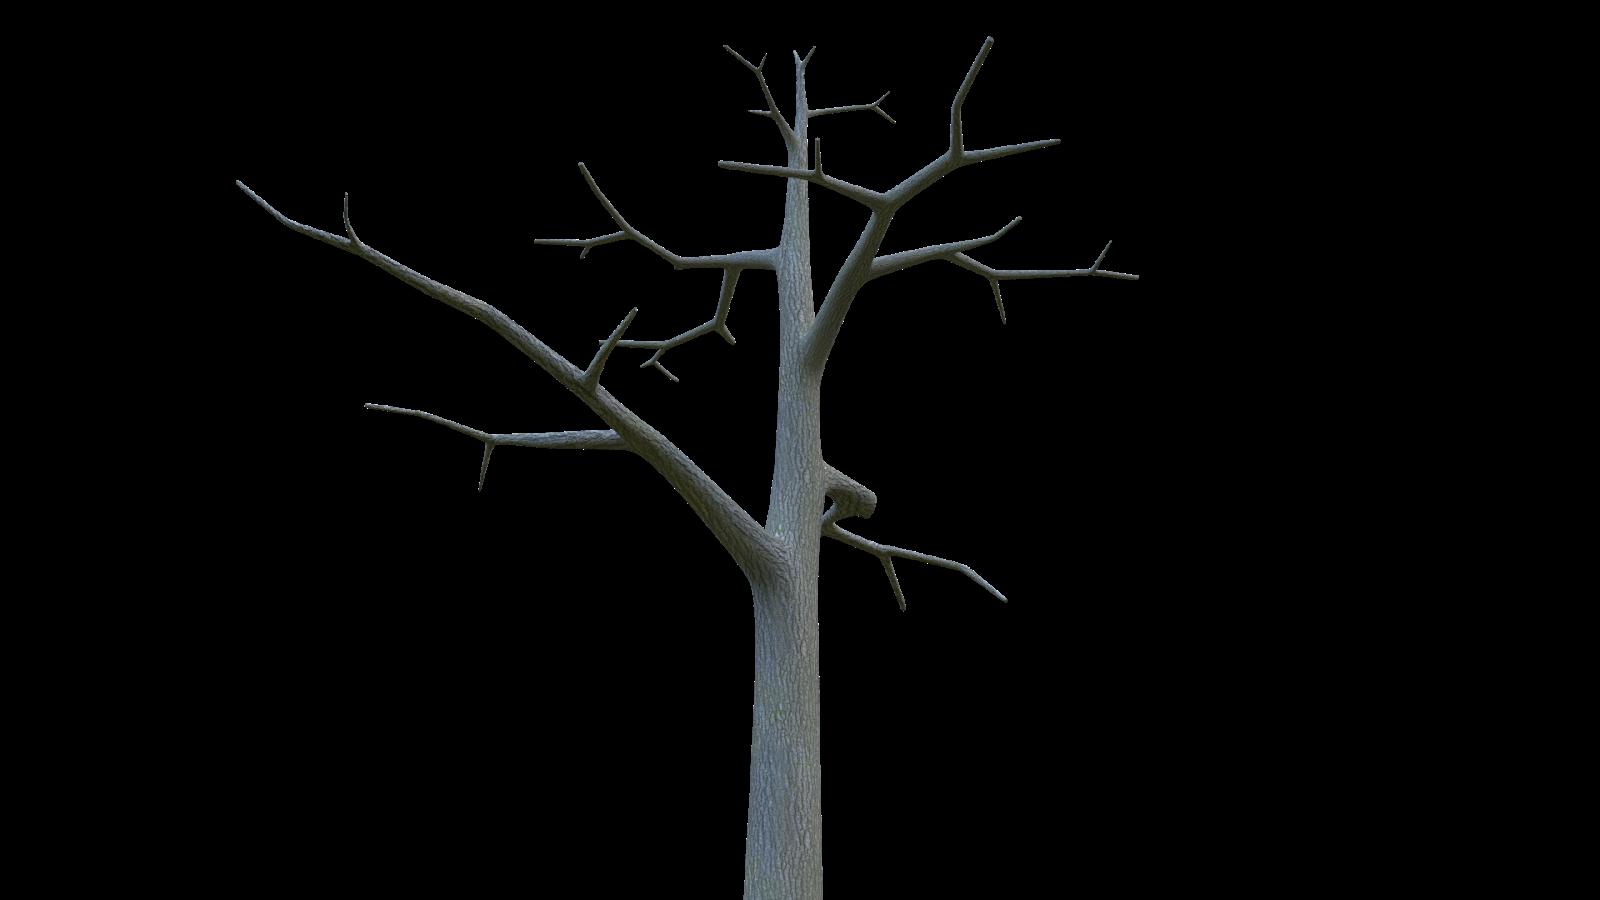 Free 3D Barren Tree CC0 3DS - Free 3D Models Under Public Domain